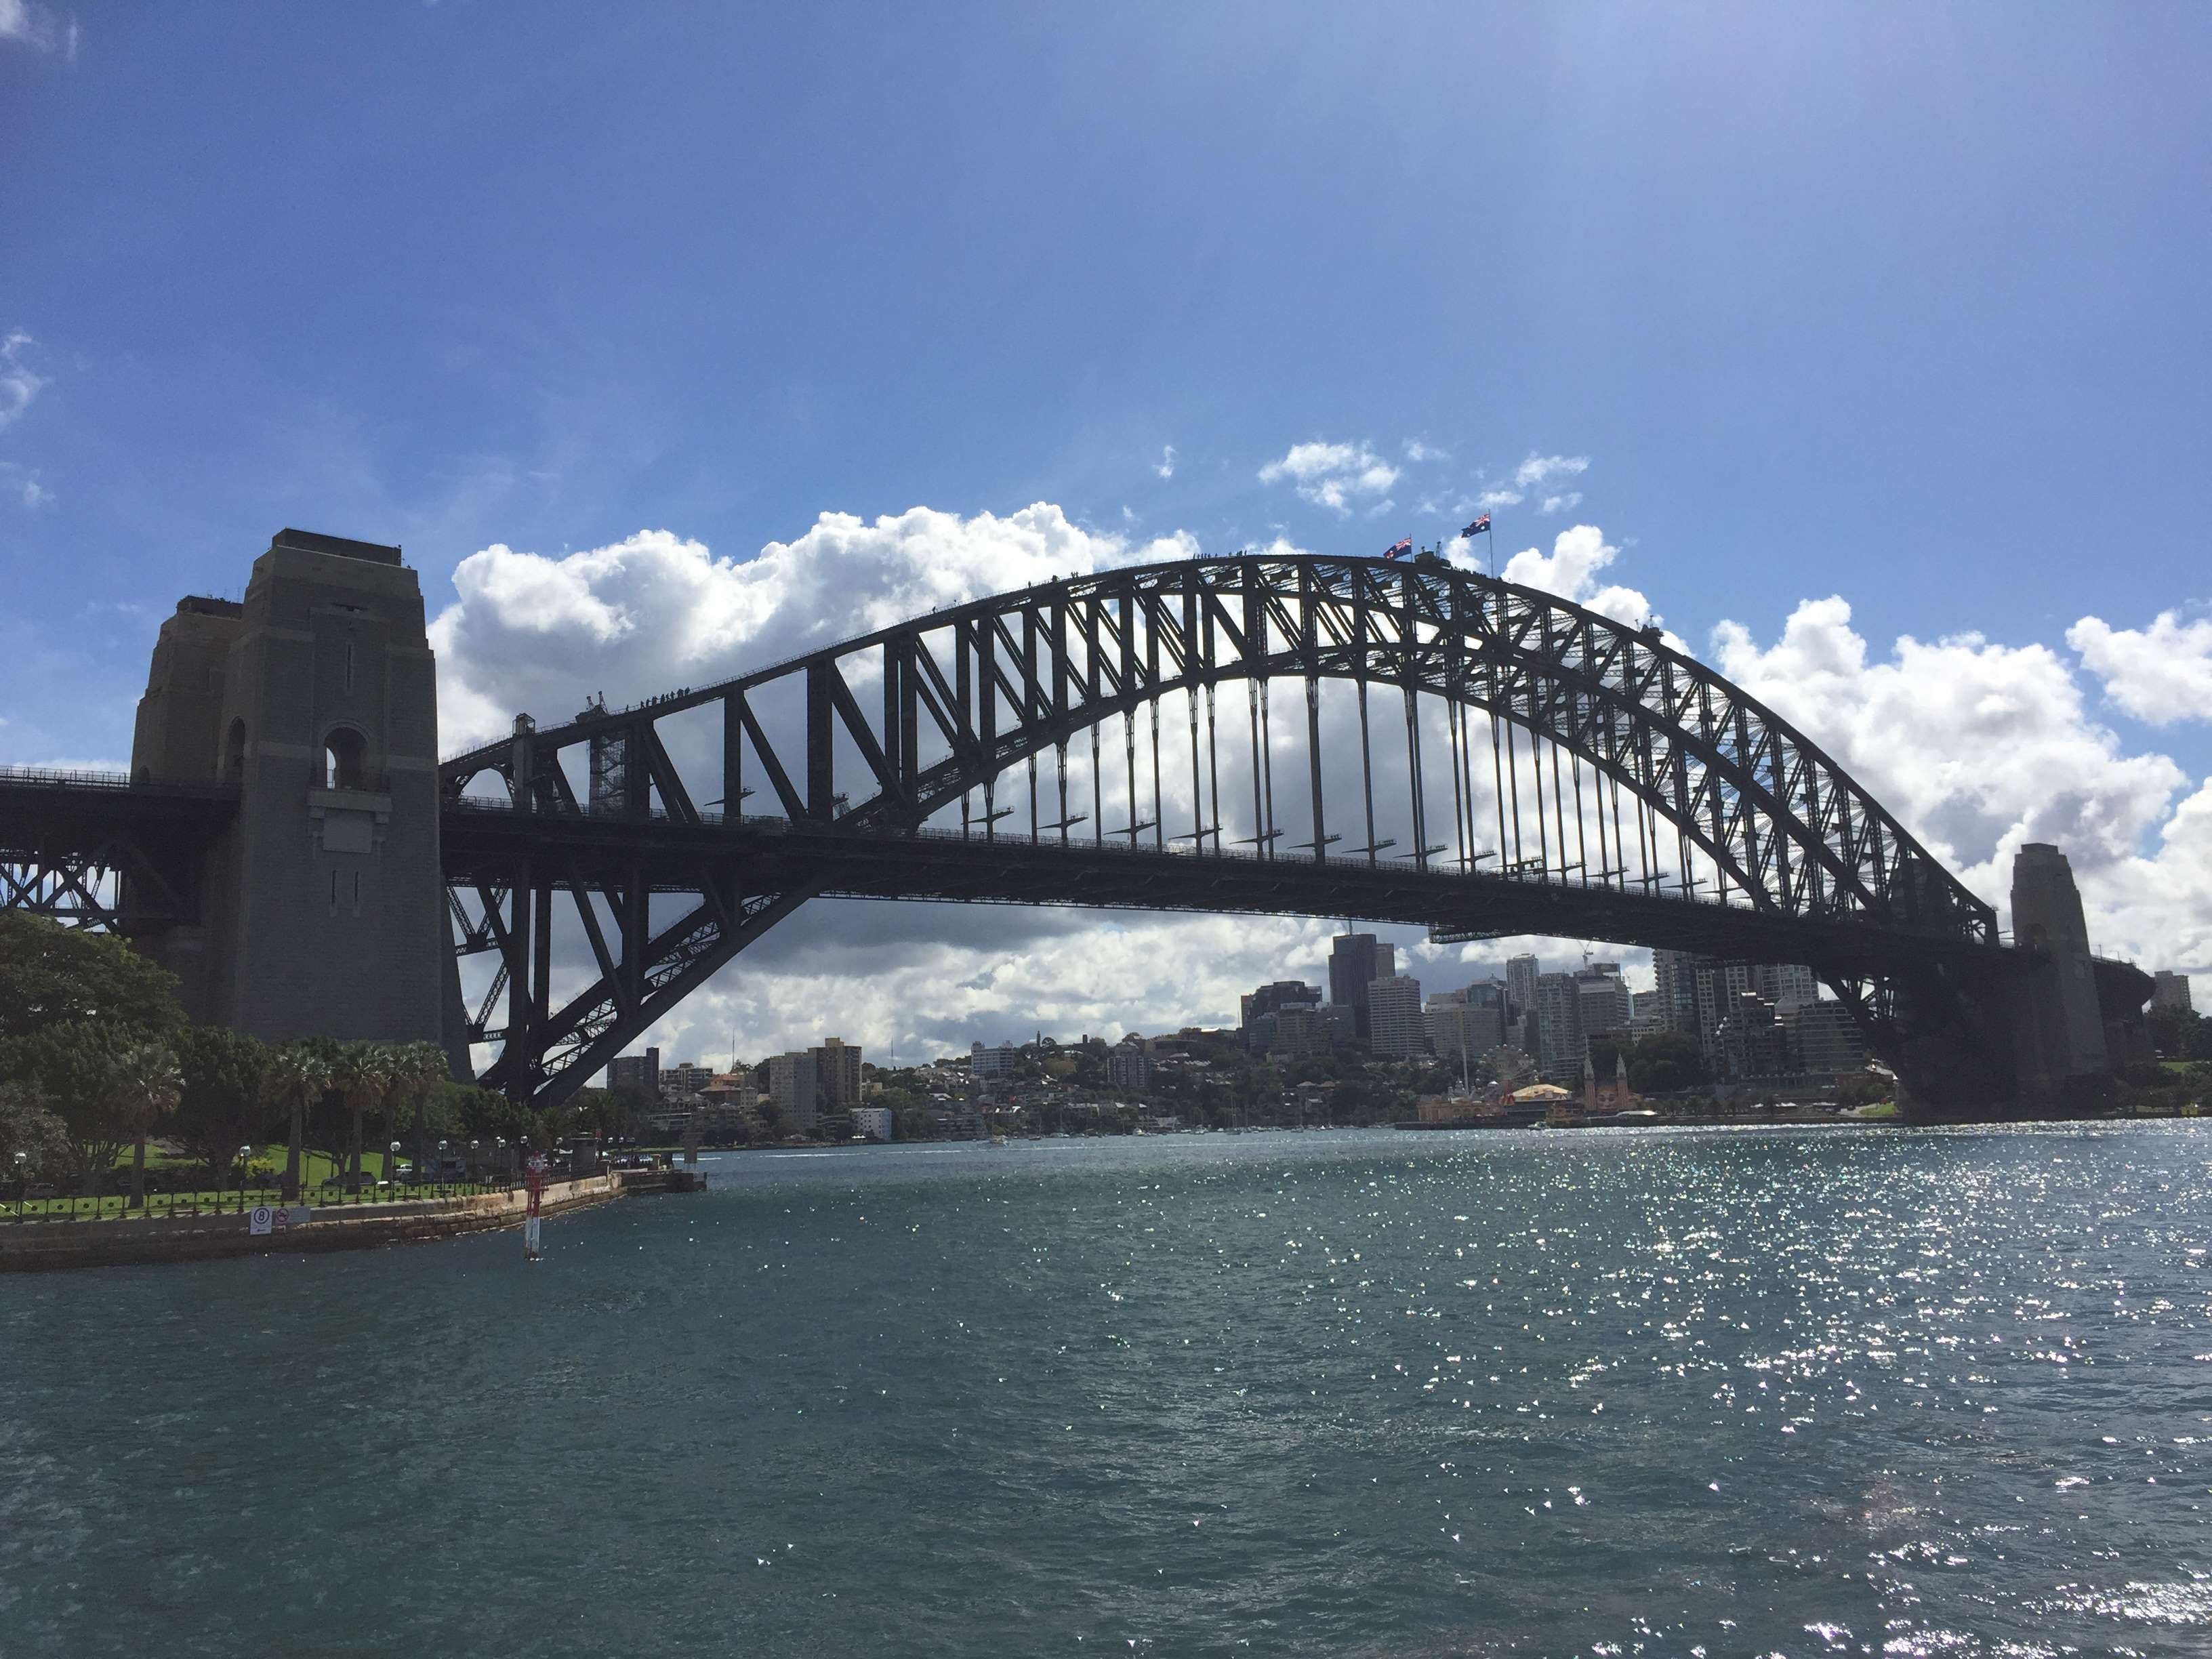 Sydney sydney harbour bridge wallpapers and backgronds sydney sydney harbour bridge altavistaventures Choice Image